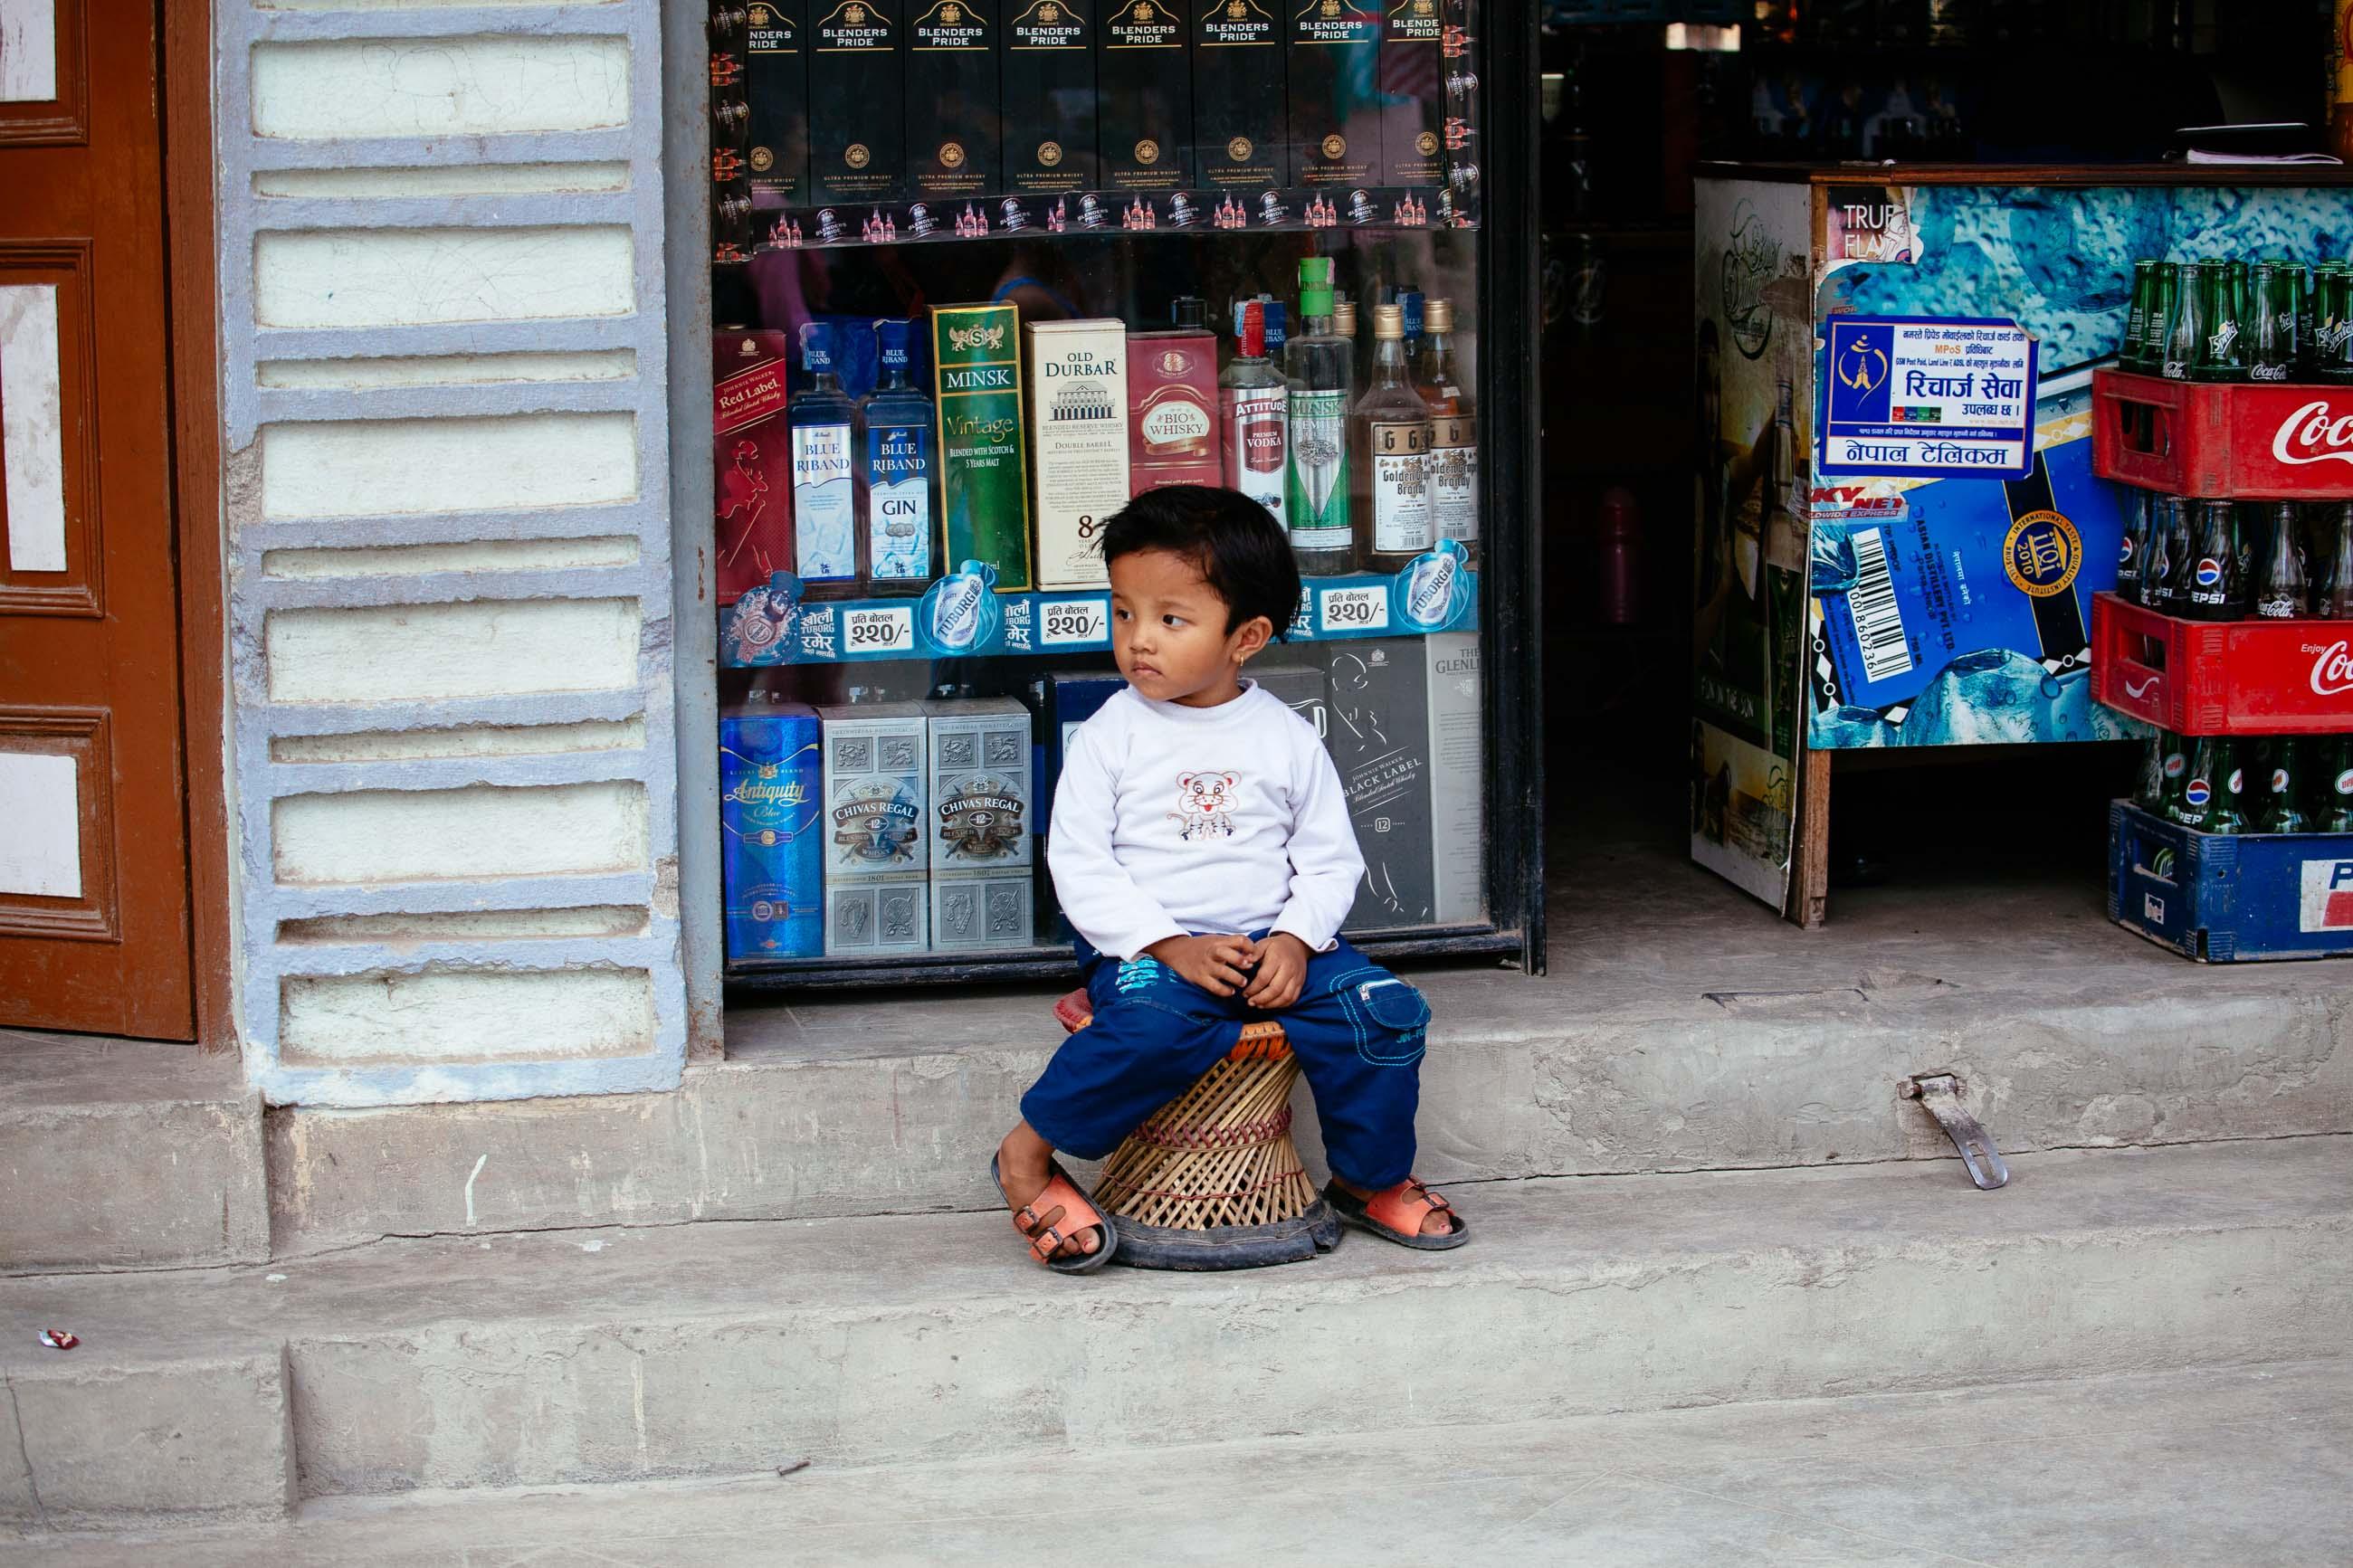 Kathmandu Whiskey Kid, Nepal Jun 2015